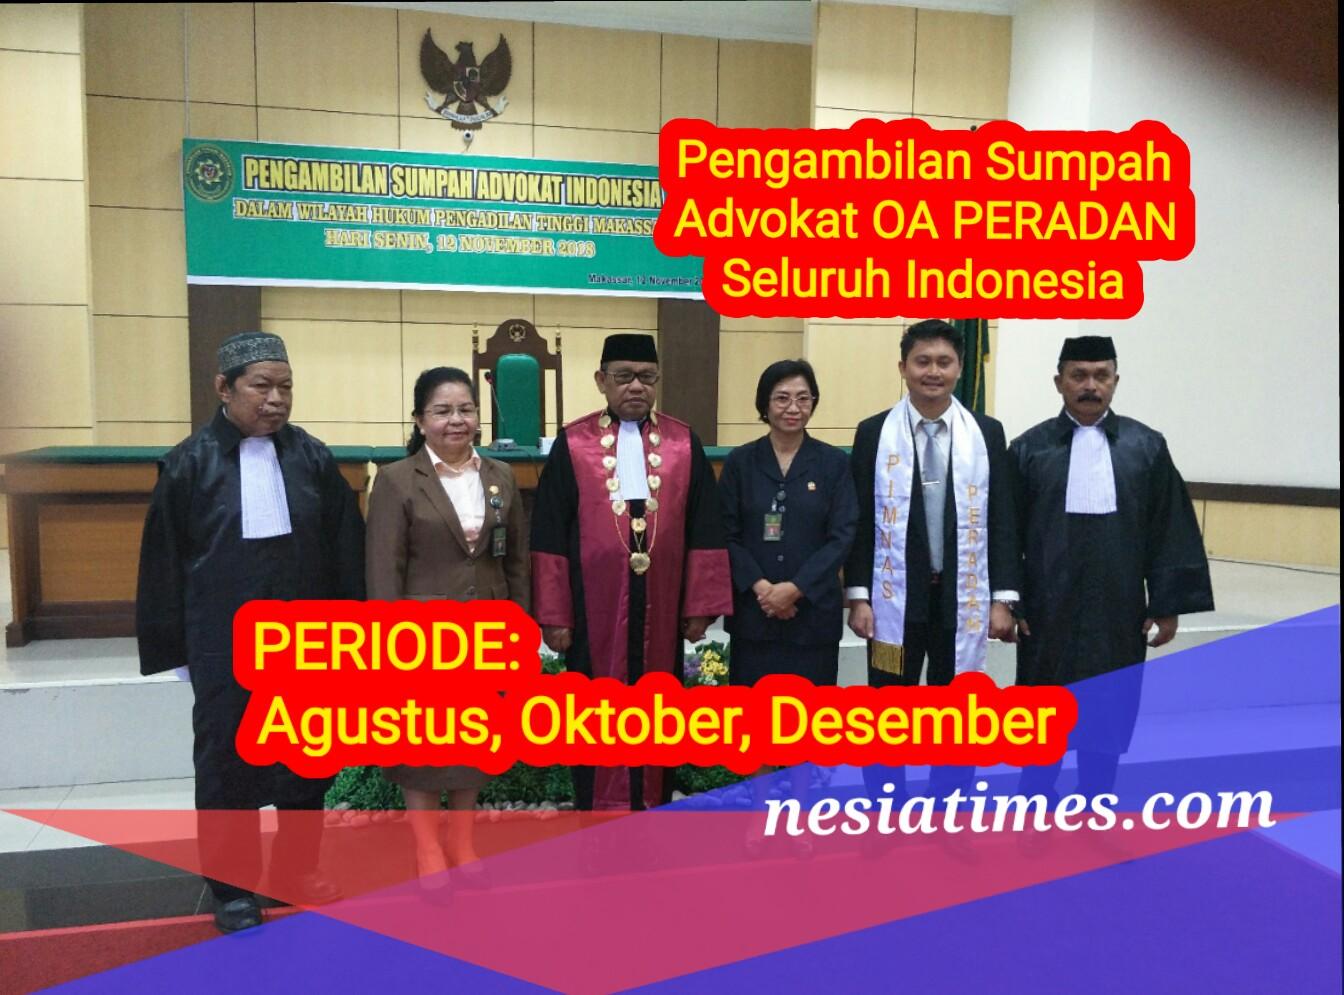 Daftar! Pengambilan Sumpah Advokat OA PERADAN Periode Agustus, Oktober dan Desember 2019 di Pengadilan Tinggi Seluruh Indonesia